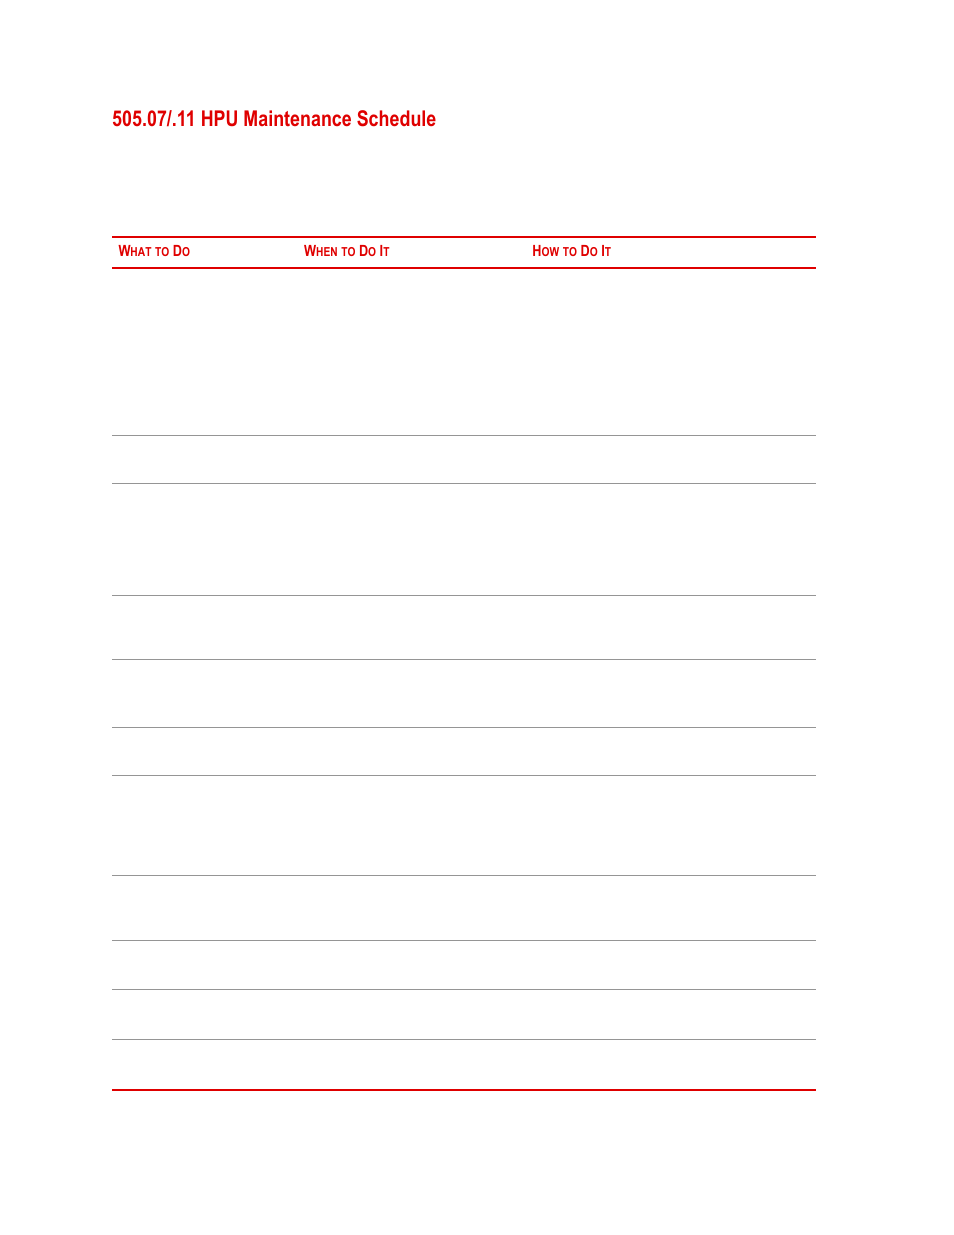 07/.11 hpu maintenance schedule, 07/.11 hpu maintenance schedule 56 | MTS  Series 505 SilentFlo Hydraulic Power Unit Model 505-11 User Manual | Page  56 / 90